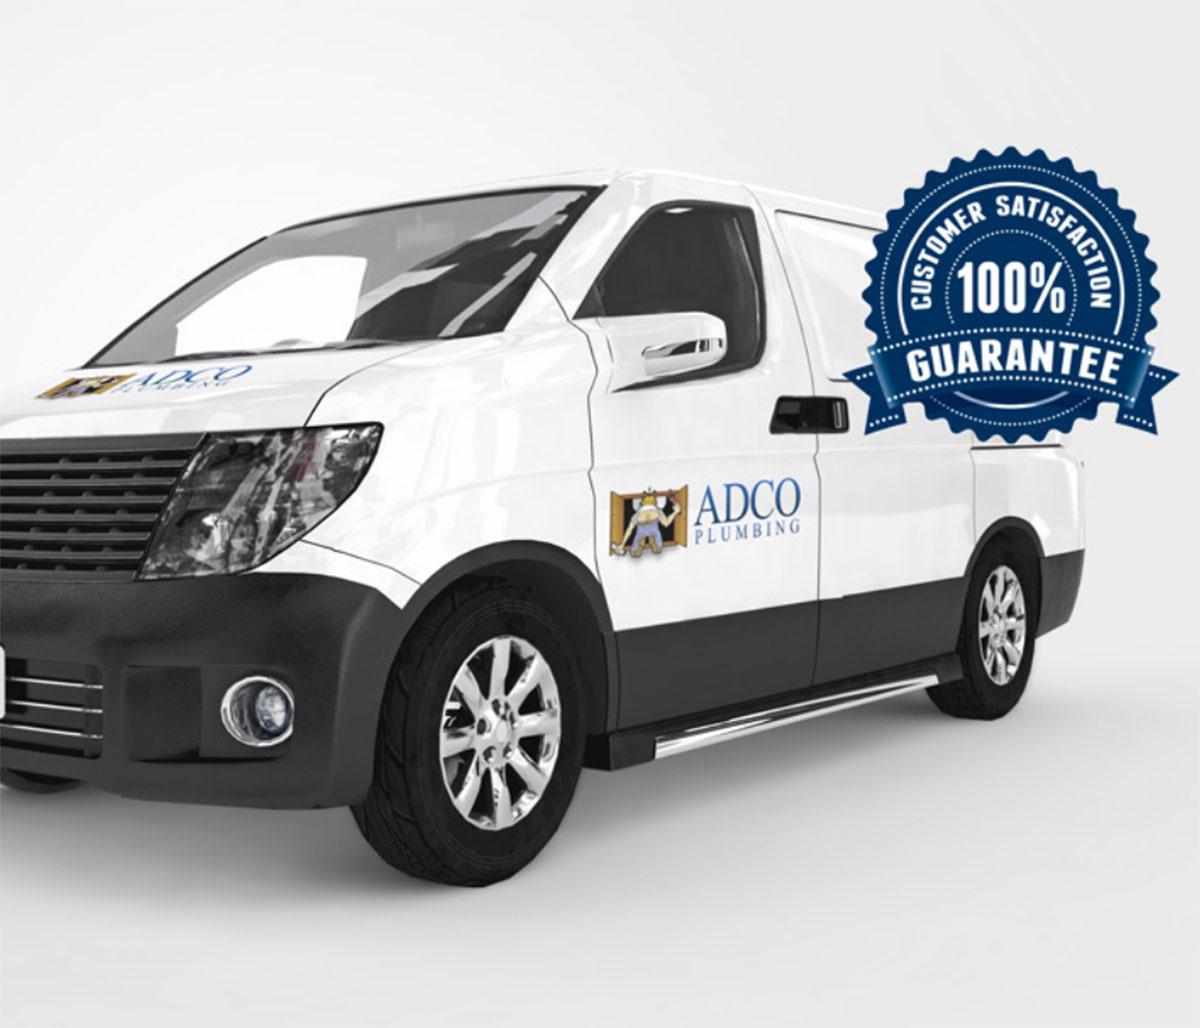 Our ADCO Plumbing Service Van